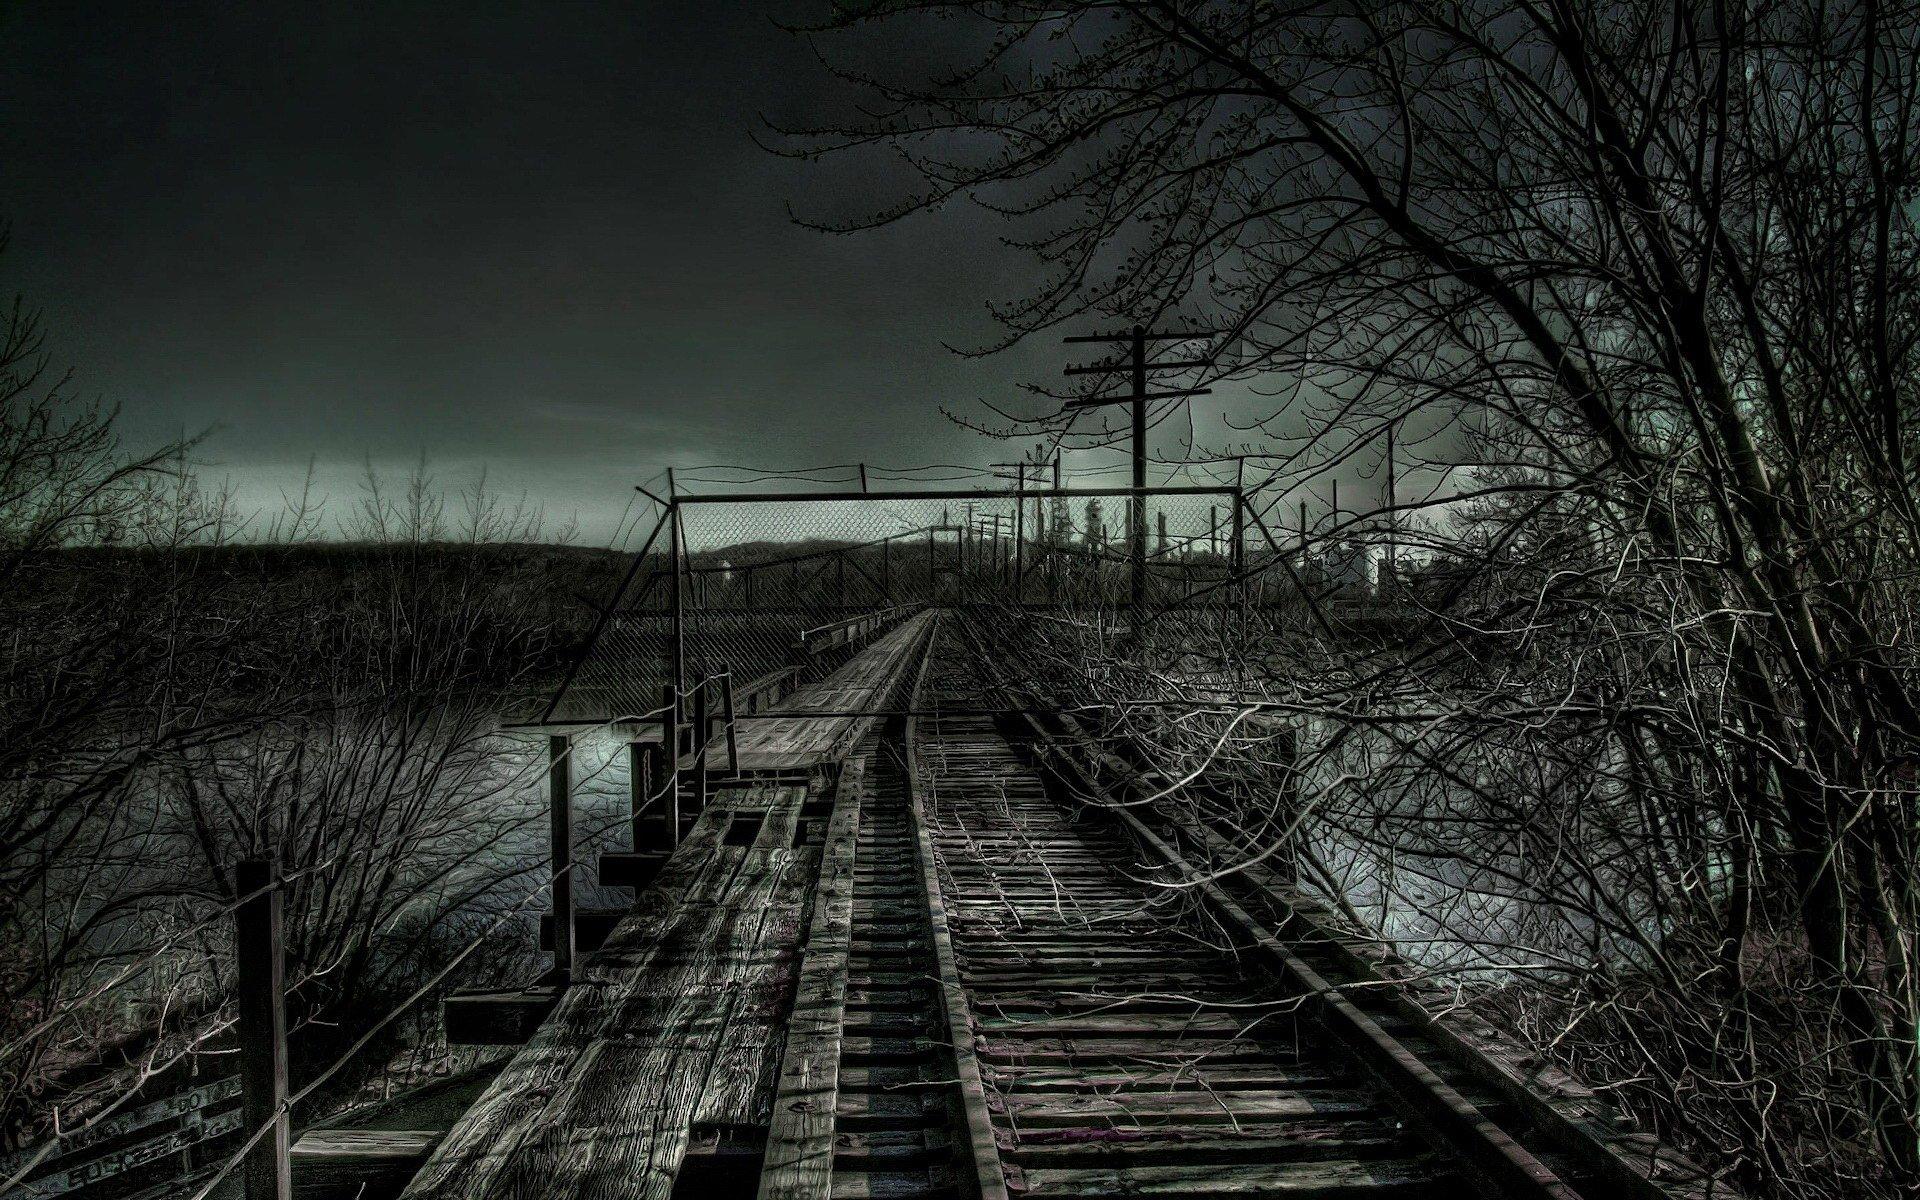 dark night railroad tracks hdr photography wallpaper | 1920x1200